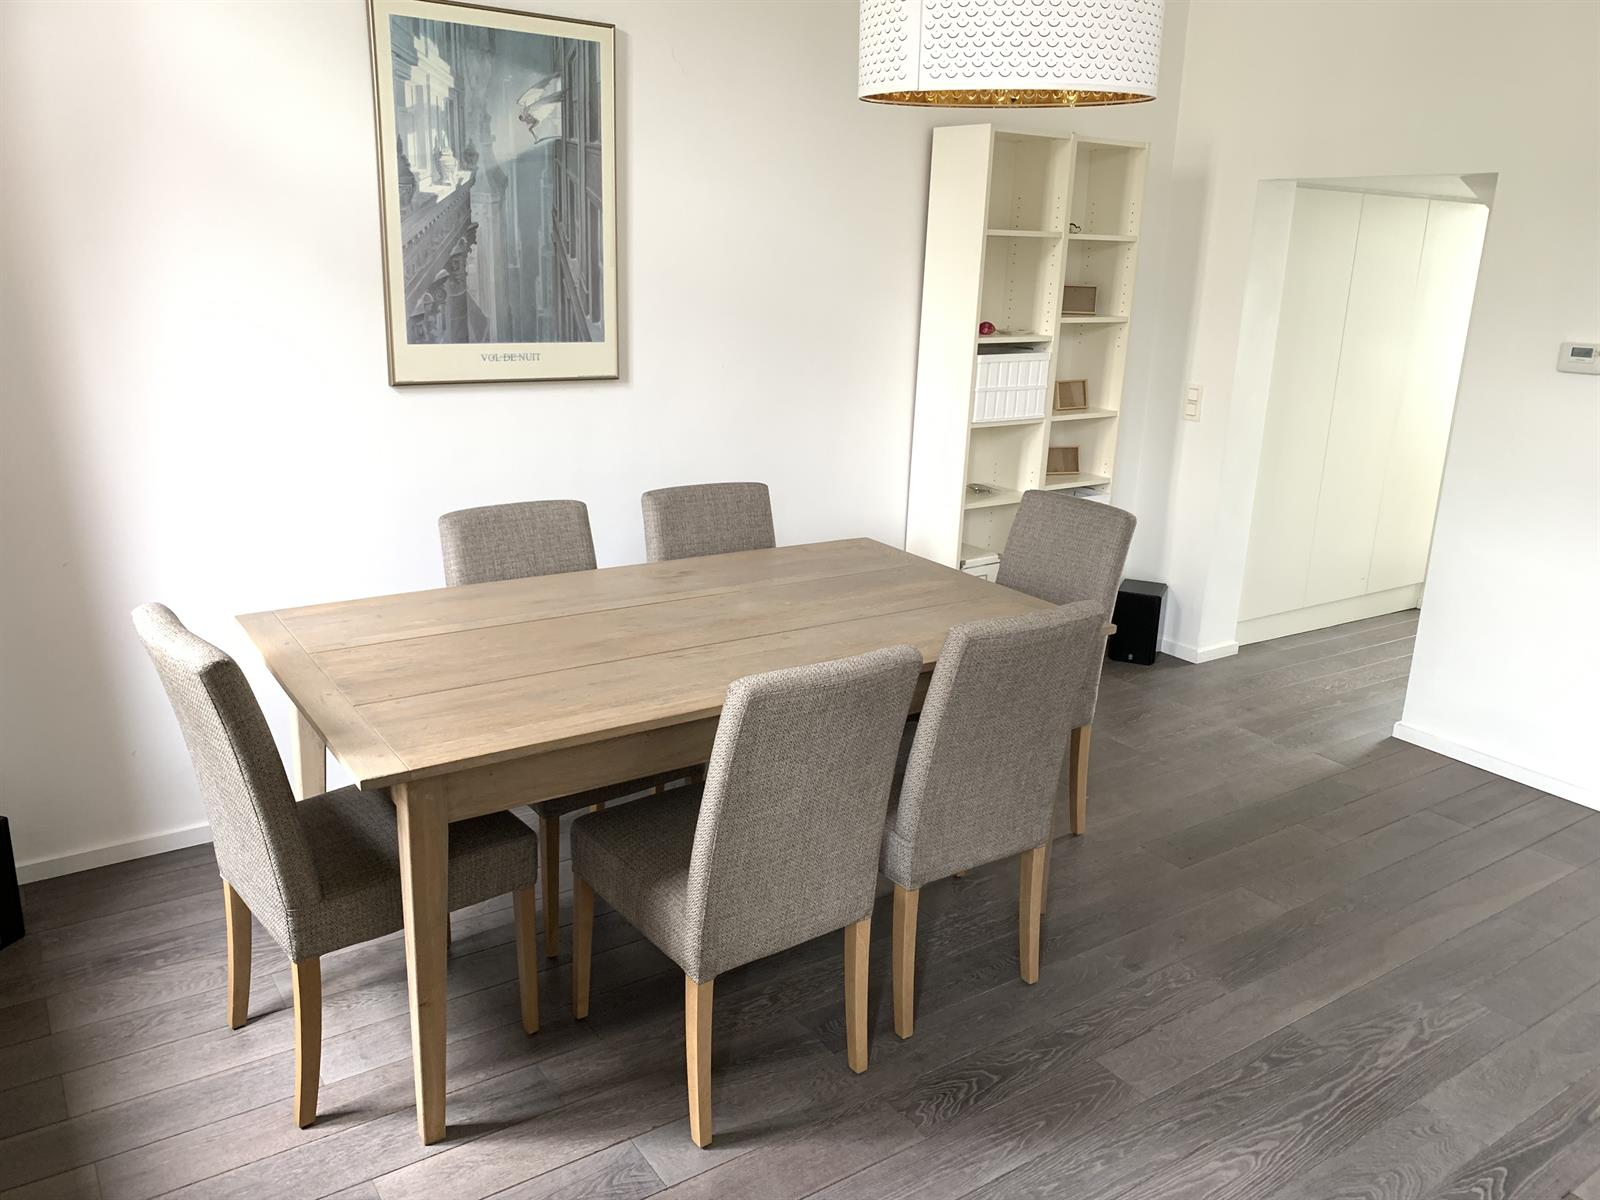 Duplex - Etterbeek - #4102292-3